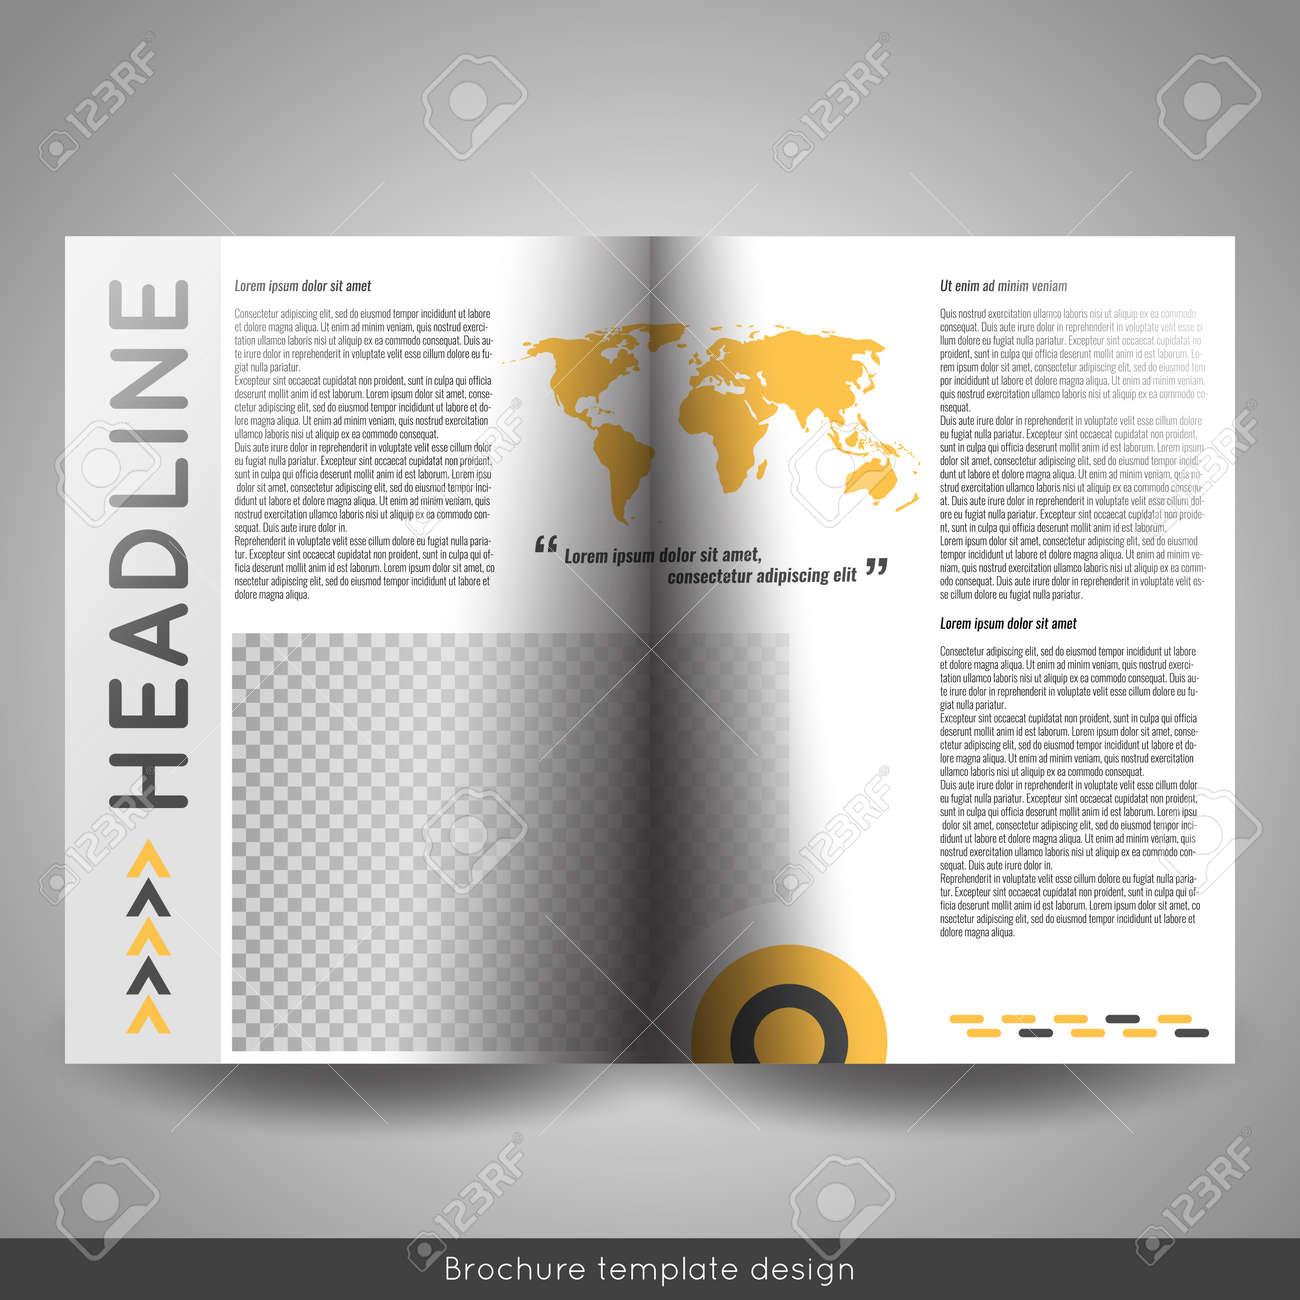 corporate bi fold brochure template design annual report presentation book cover or - Bi Fold Brochure Template